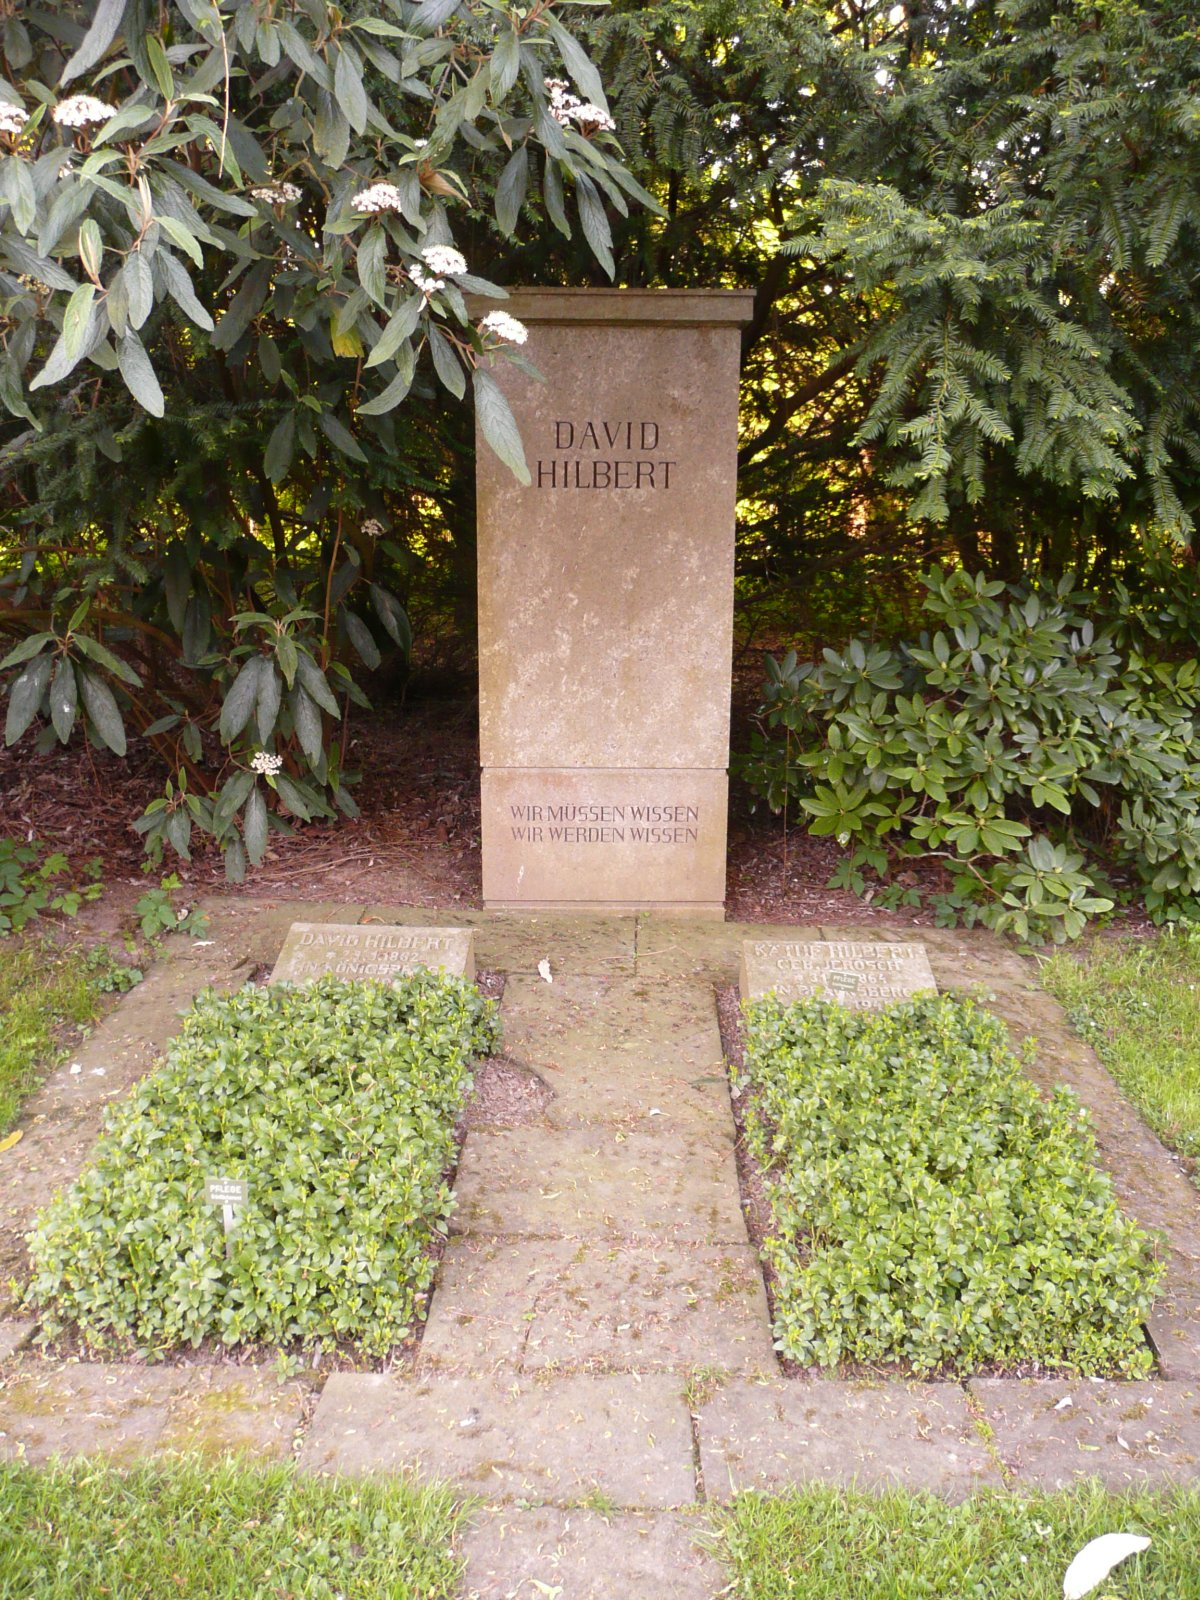 Hilbert epitafio.jpg